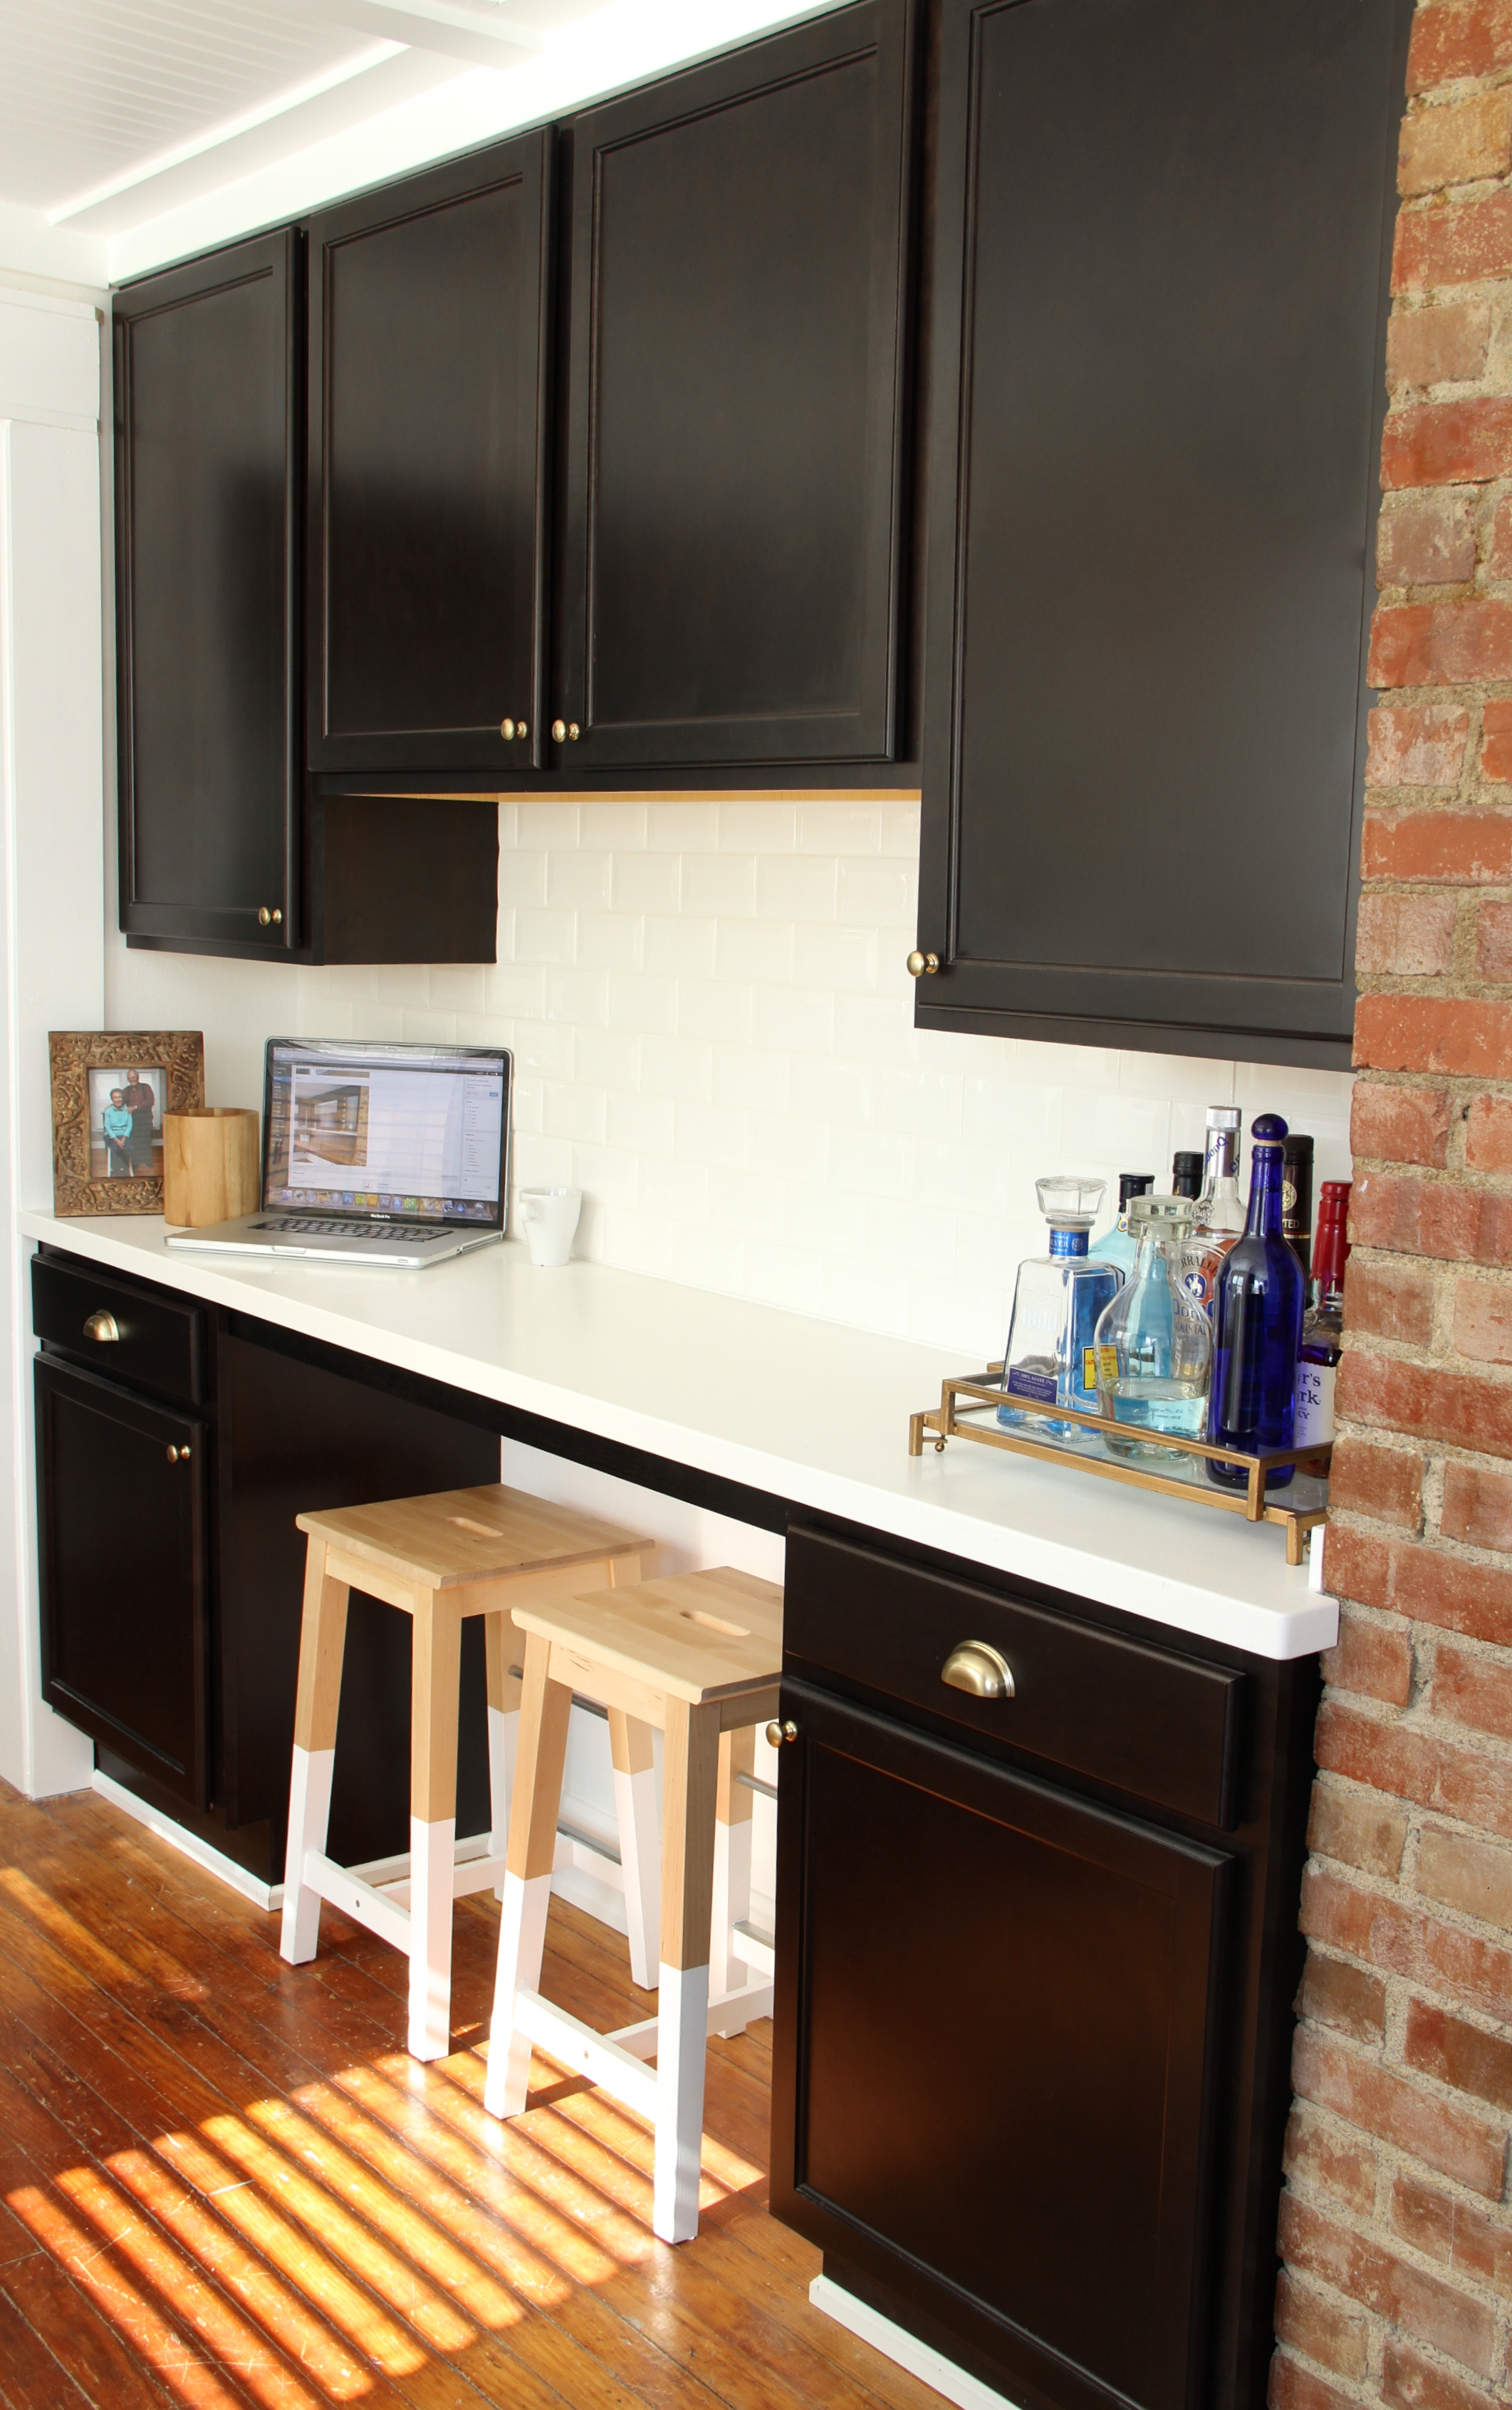 Inspiring Kitchen Base Cabinets Shallow Images - Best image house ...